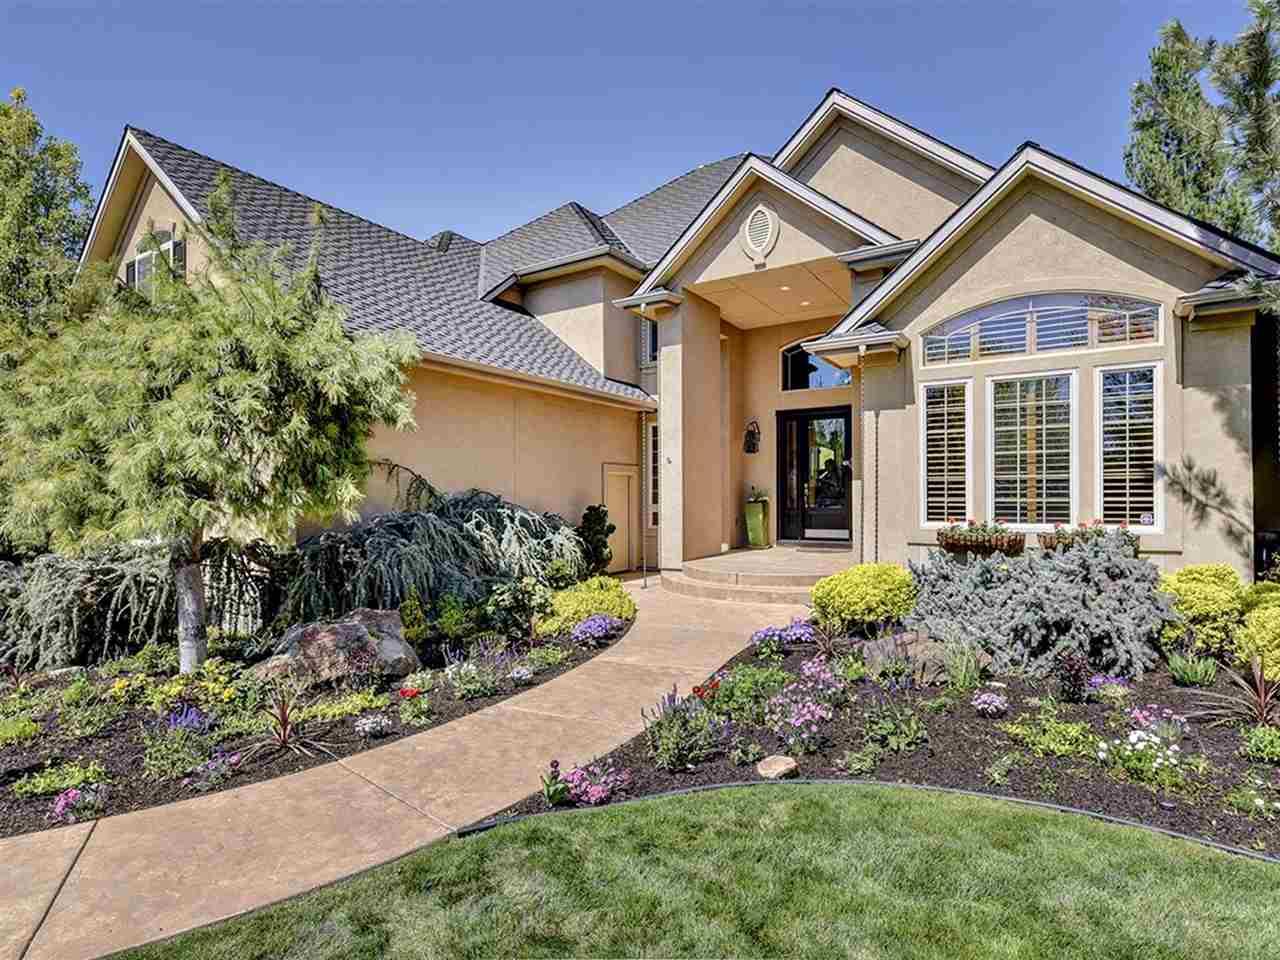 5426 E Quartersawn, Boise, ID 83716